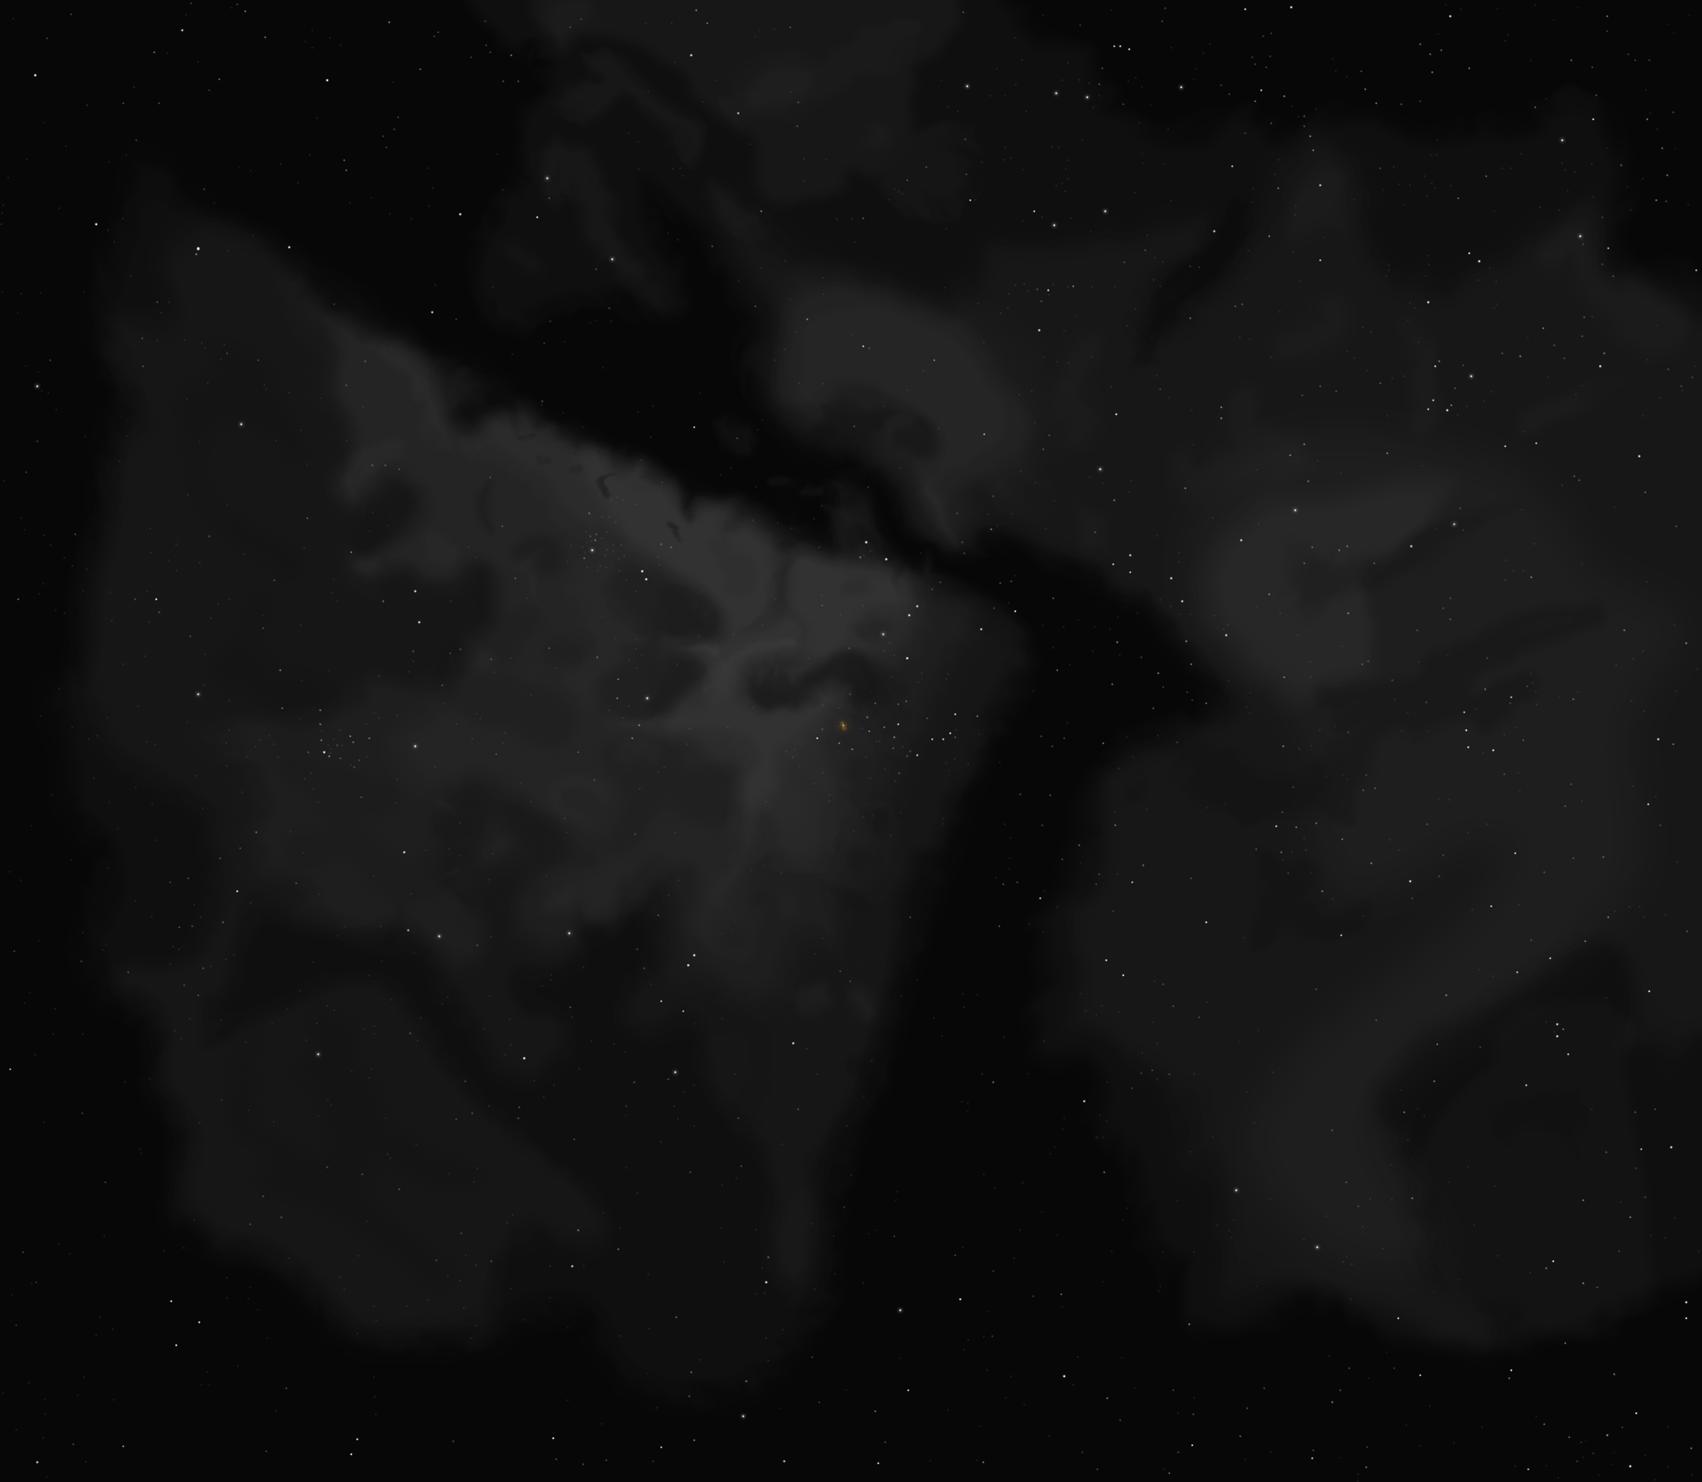 2019_07_02-NGC3372-Carene-g.png